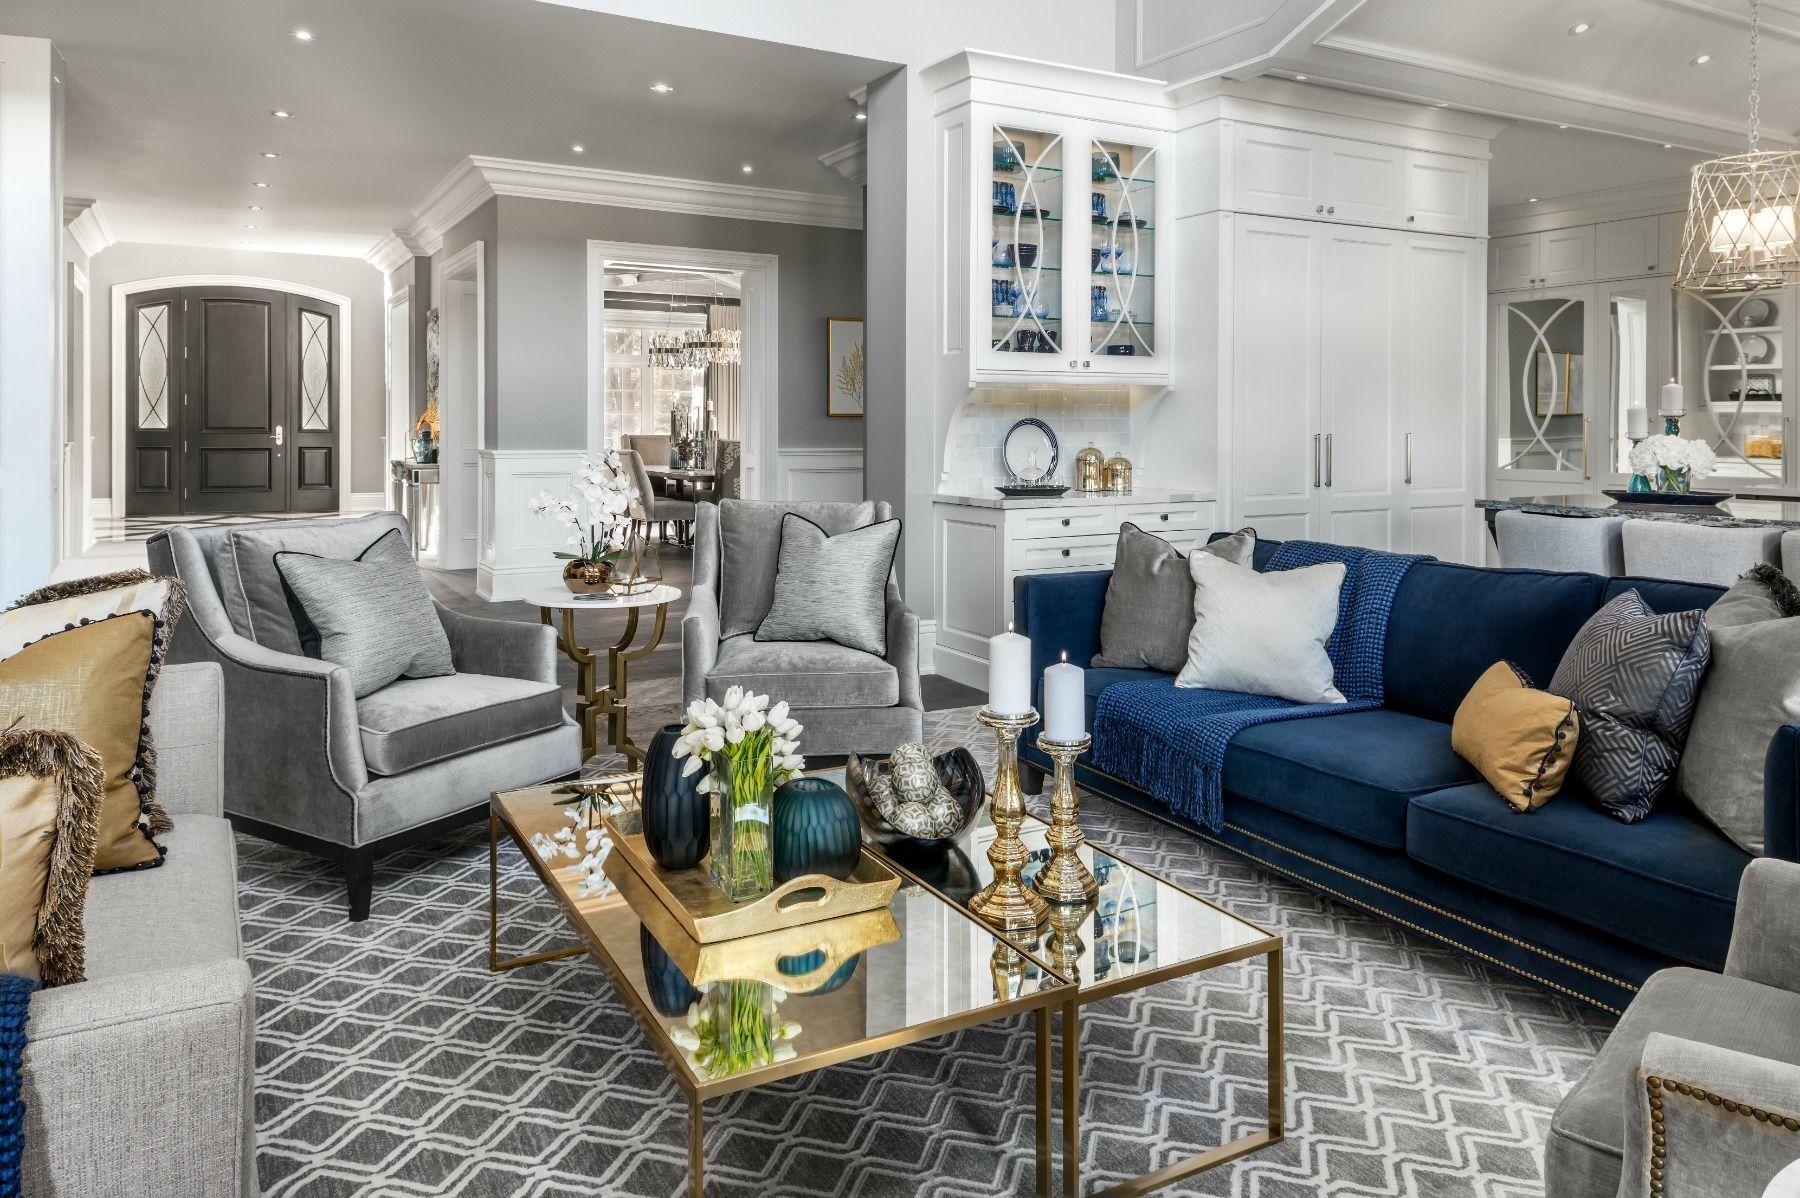 Best Mtm Revelation Kid Friendly Living Room Furniture 400 x 300